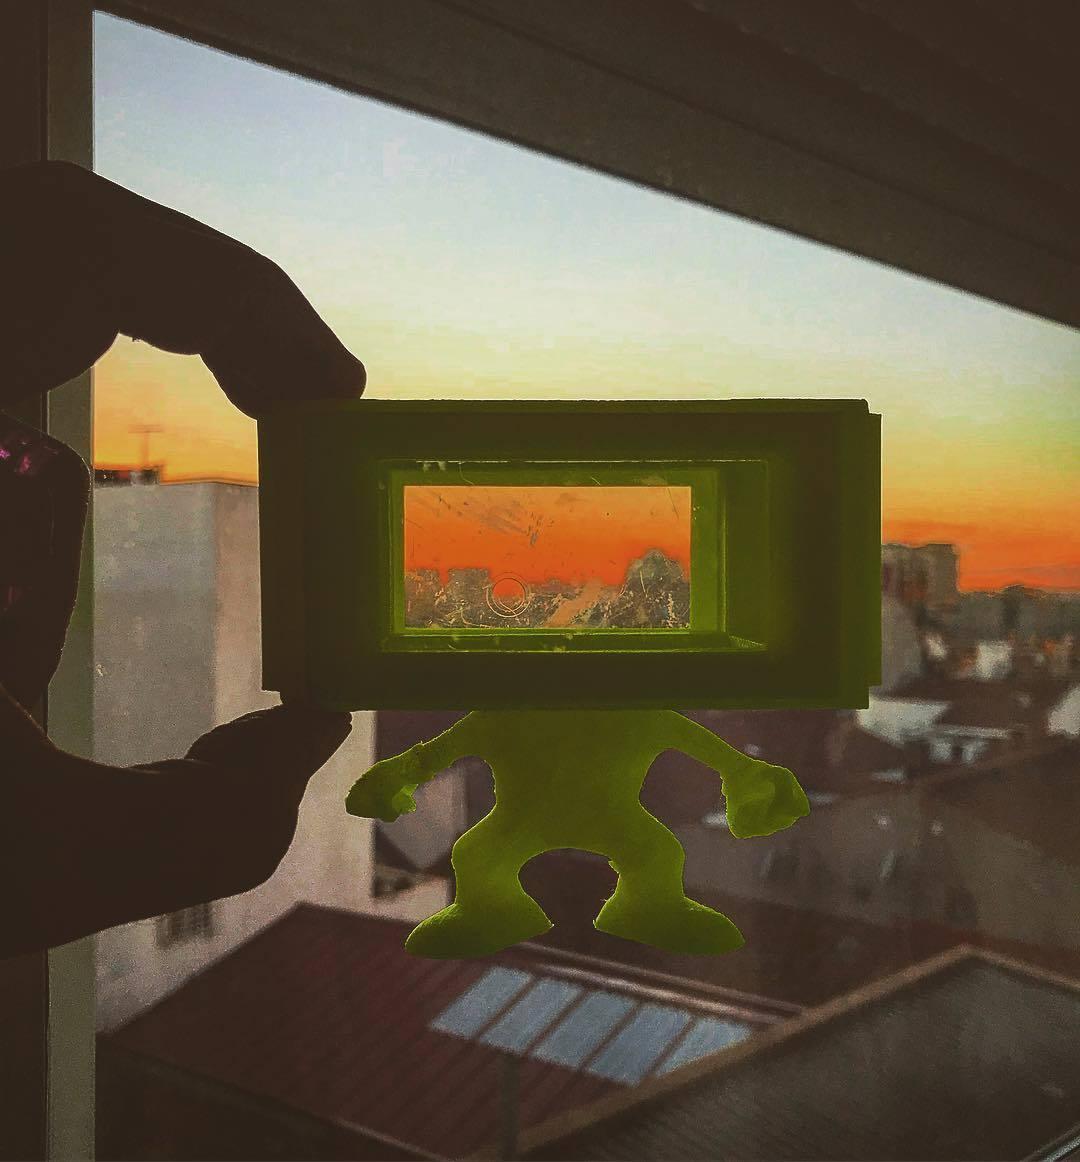 TY.jpg Download free STL file FISH TANK FUNKO POP OR PEGGYBANK • 3D printer template, gaaraa